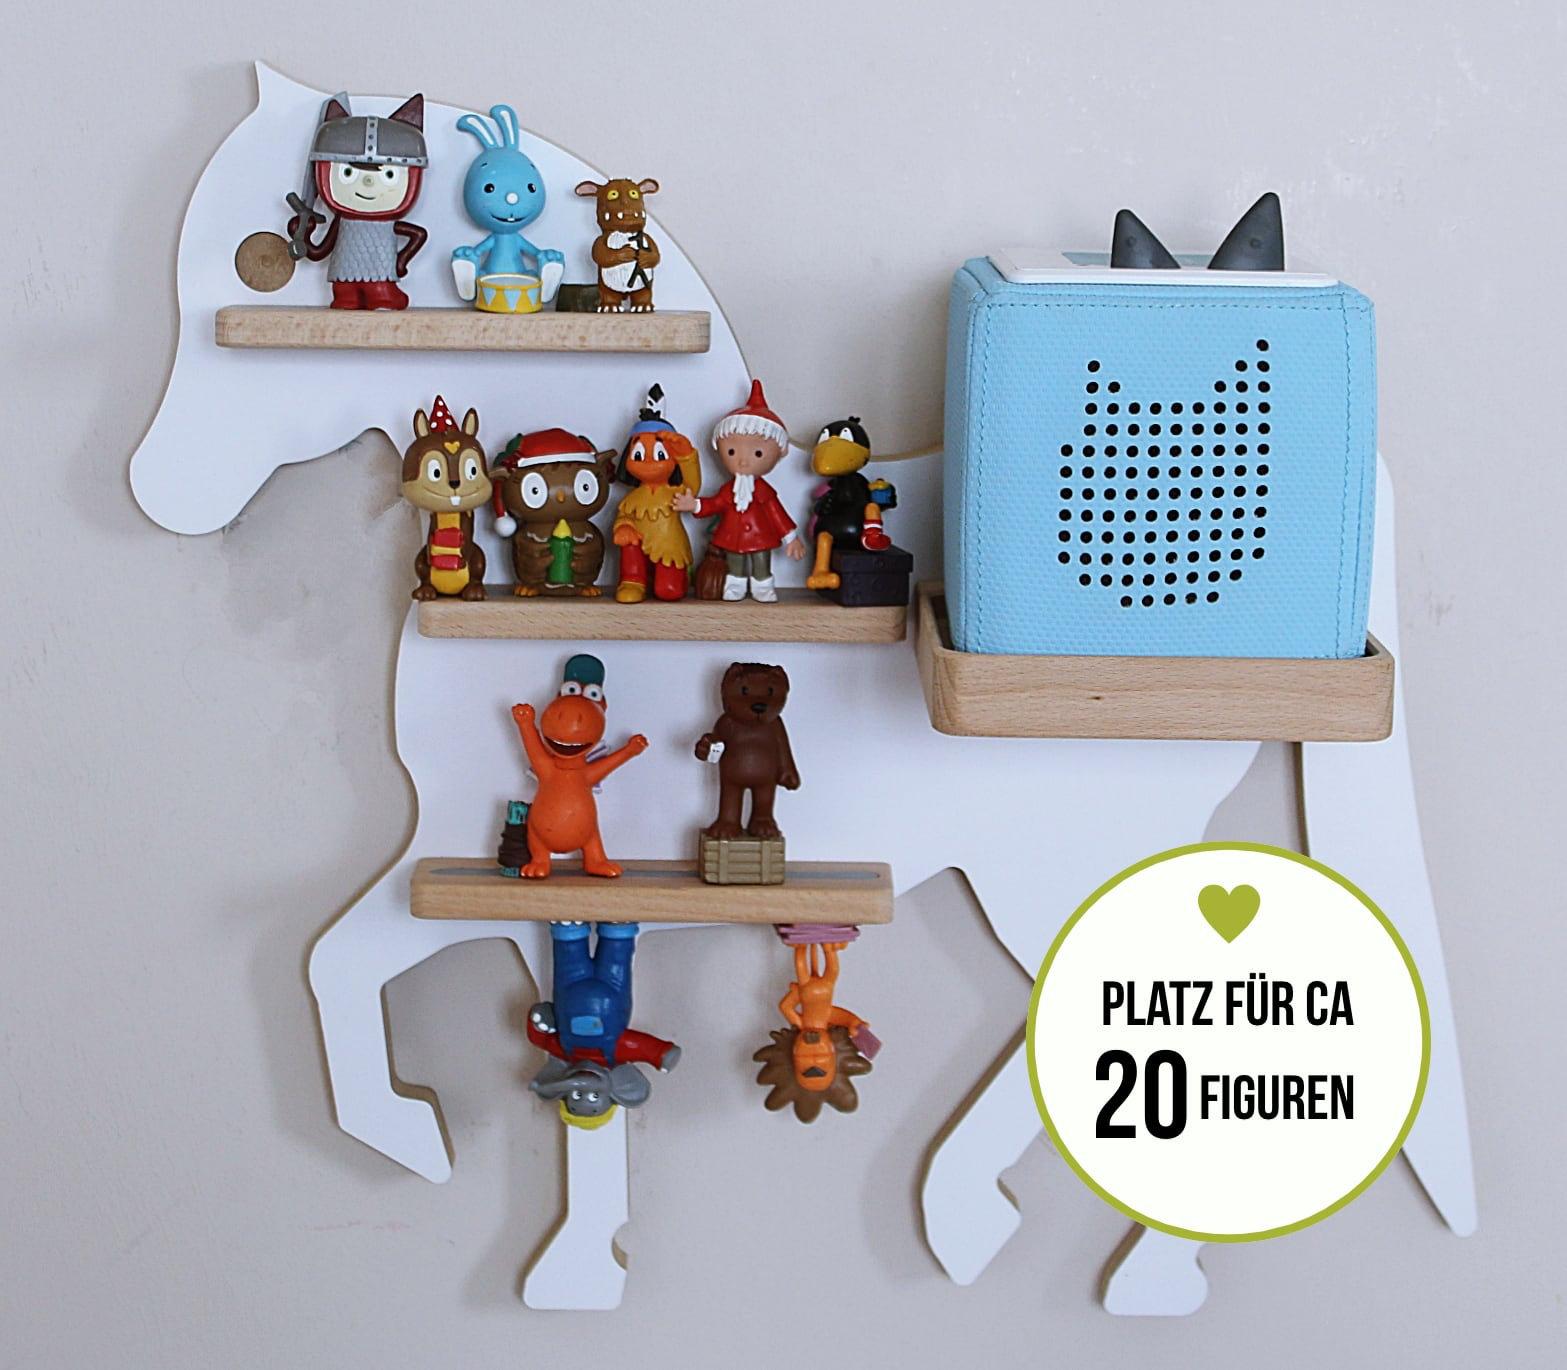 Tonie Box Regal Bauanleitung Toniebox 2020 07 24